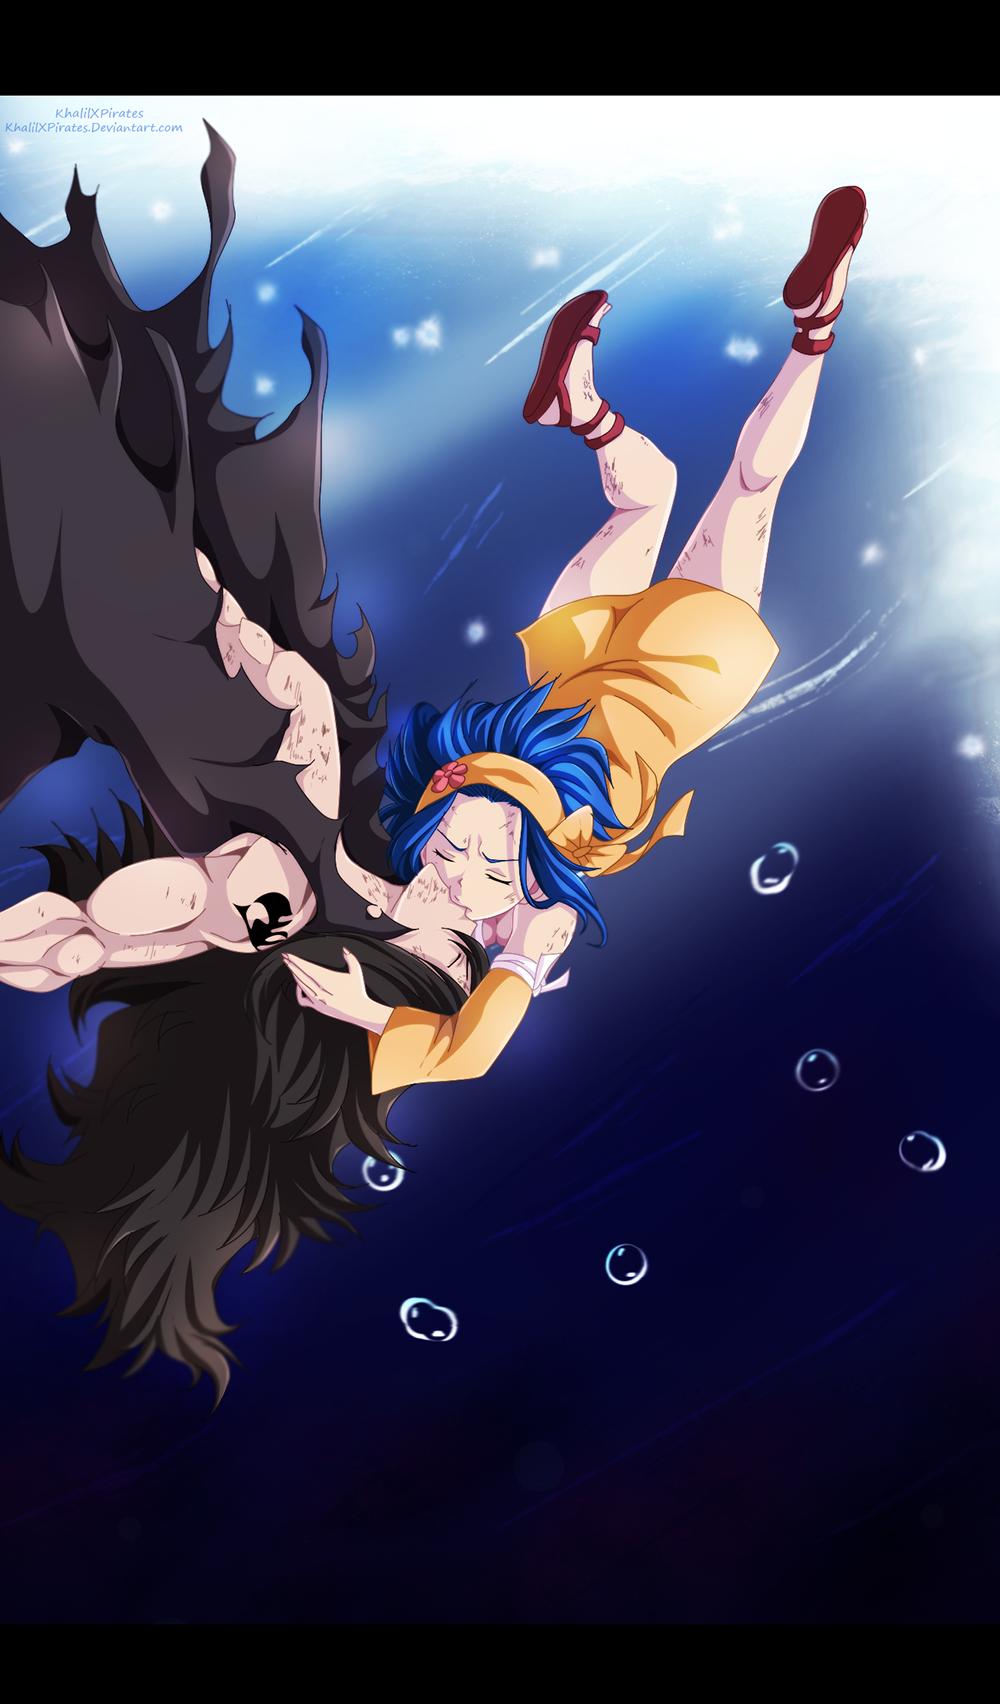 gajeel x levy kiss gajeel vs torafusa levy s kiss fairy tail 396